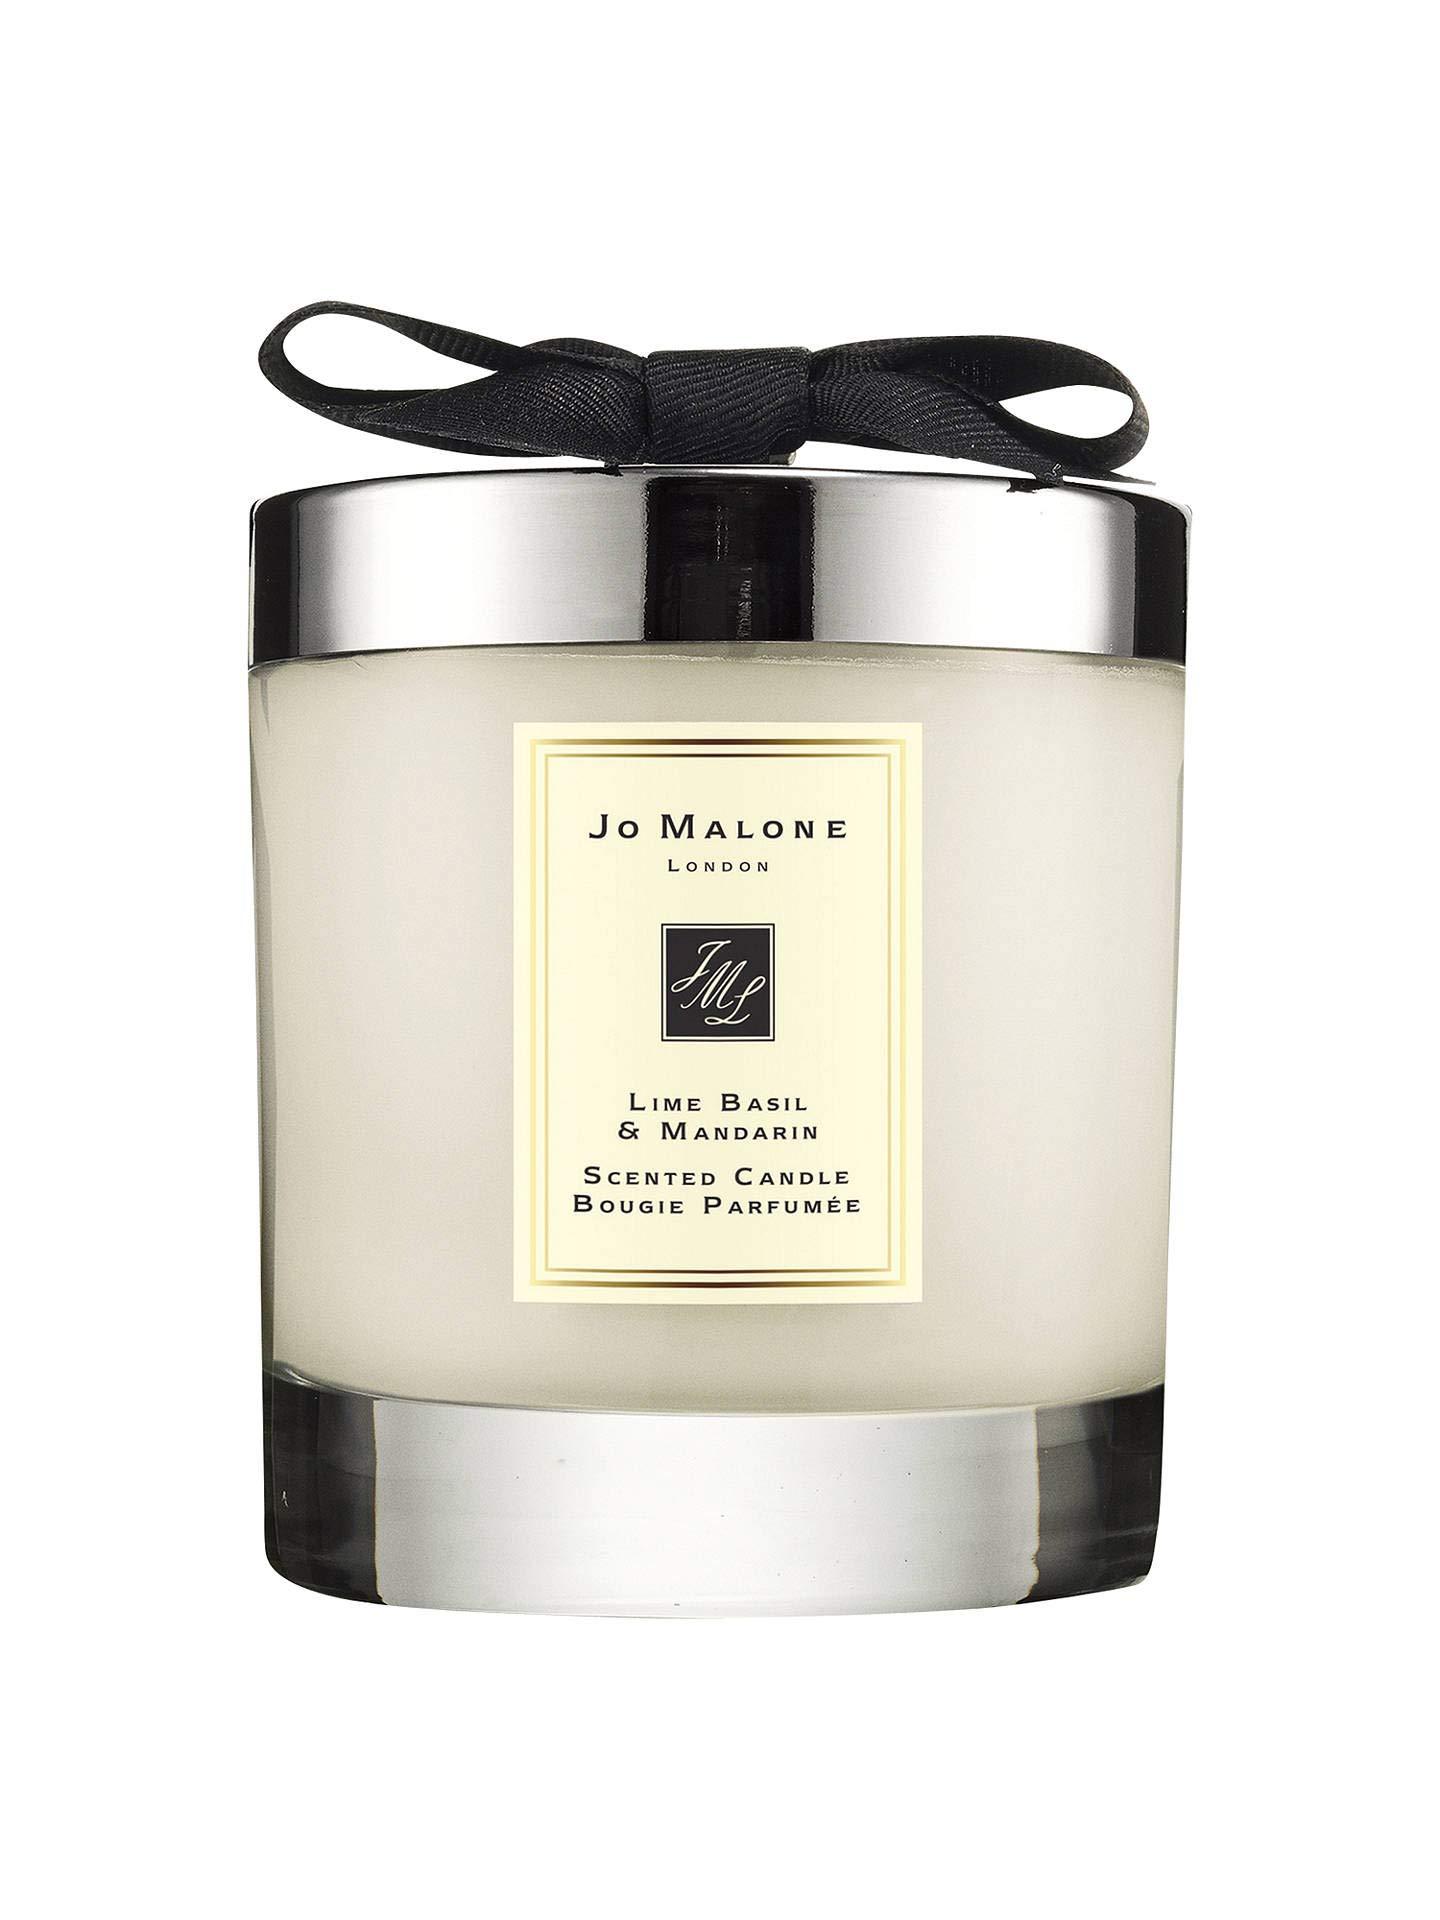 Jo Malone Lime Basil & Mandarin Home Candle 200g